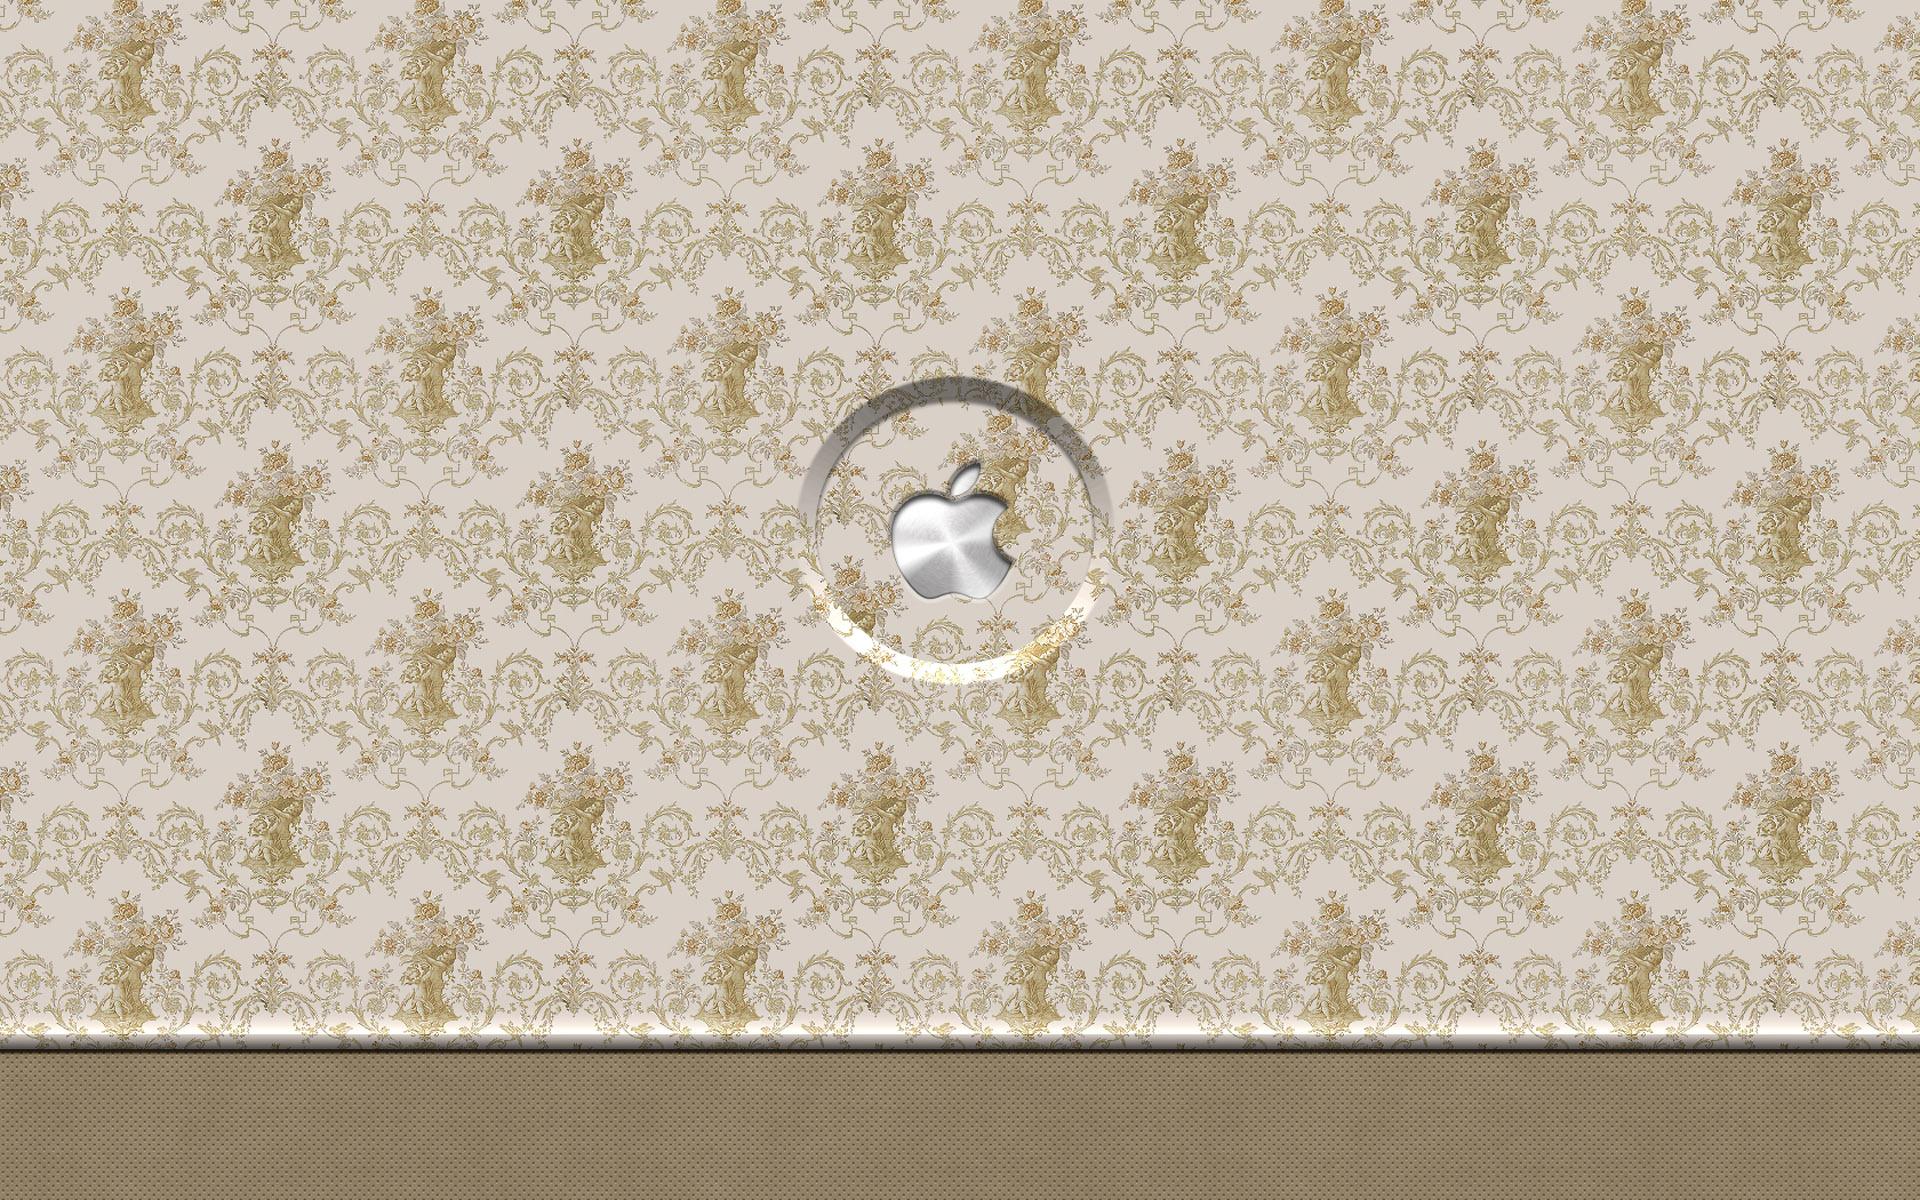 Apple mac wallpapers